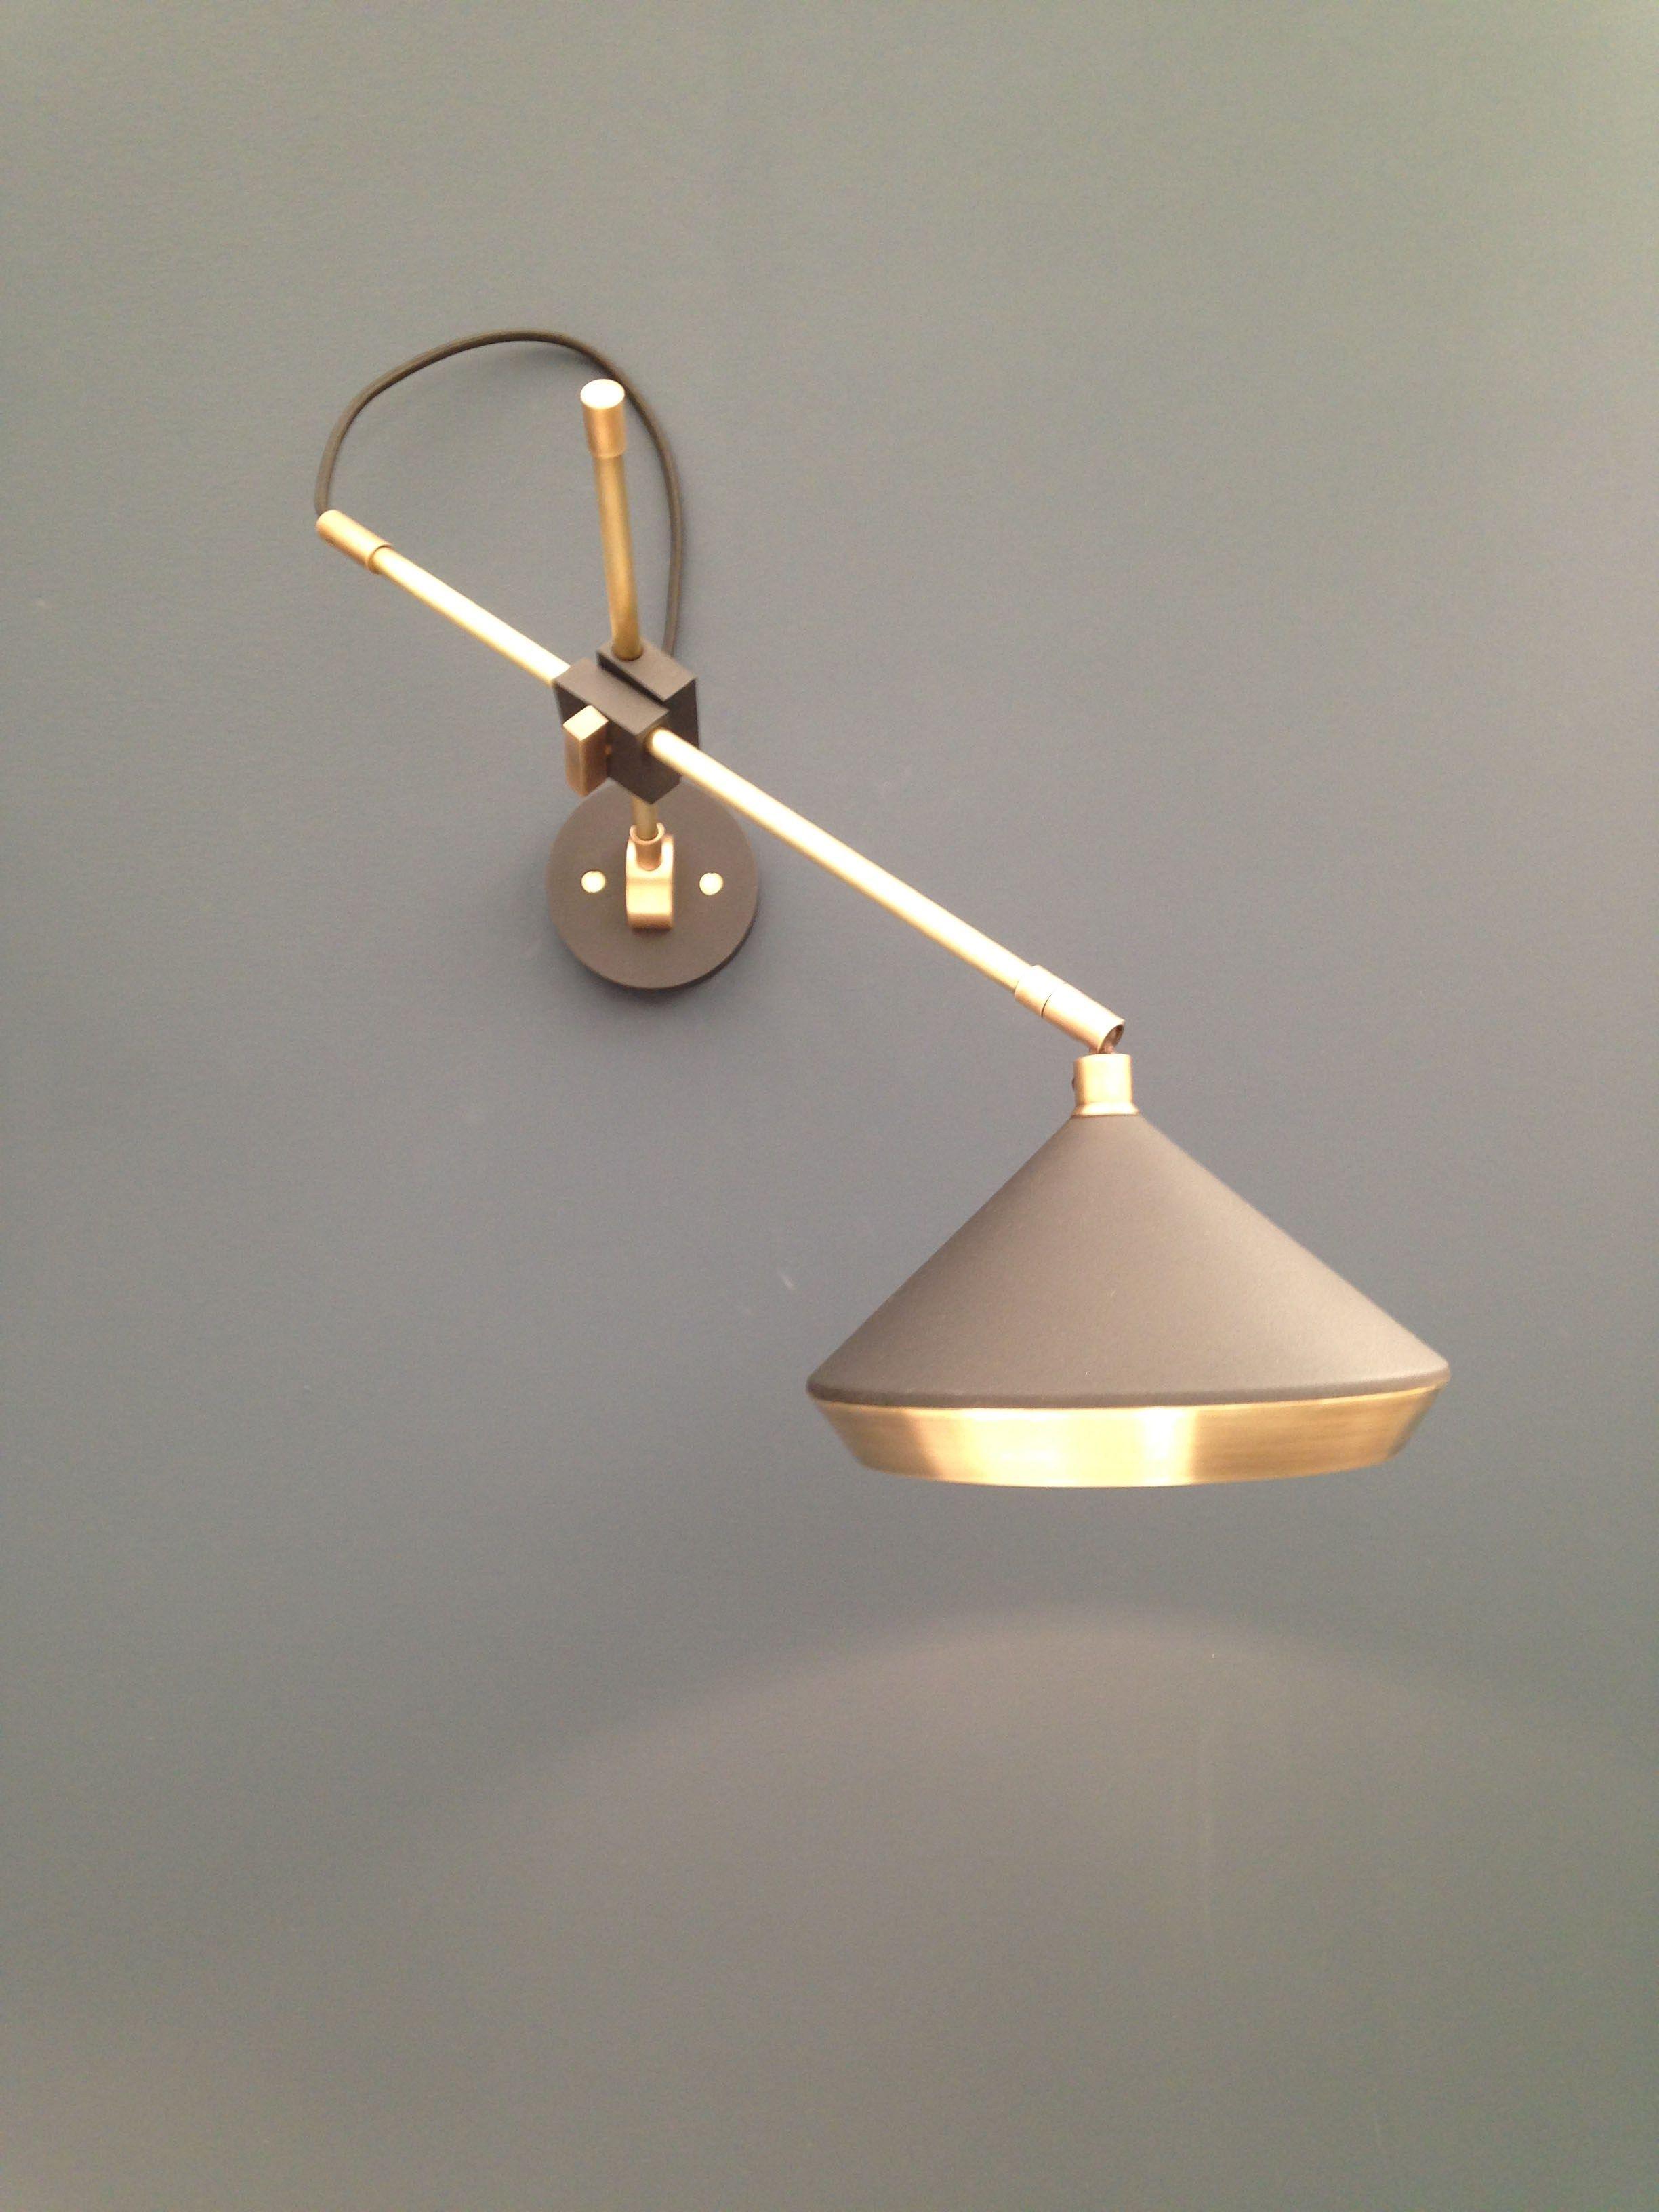 Bert Frank Sheer Wall Light Jpg 2448 3264 Wall Lights Light Light Fittings